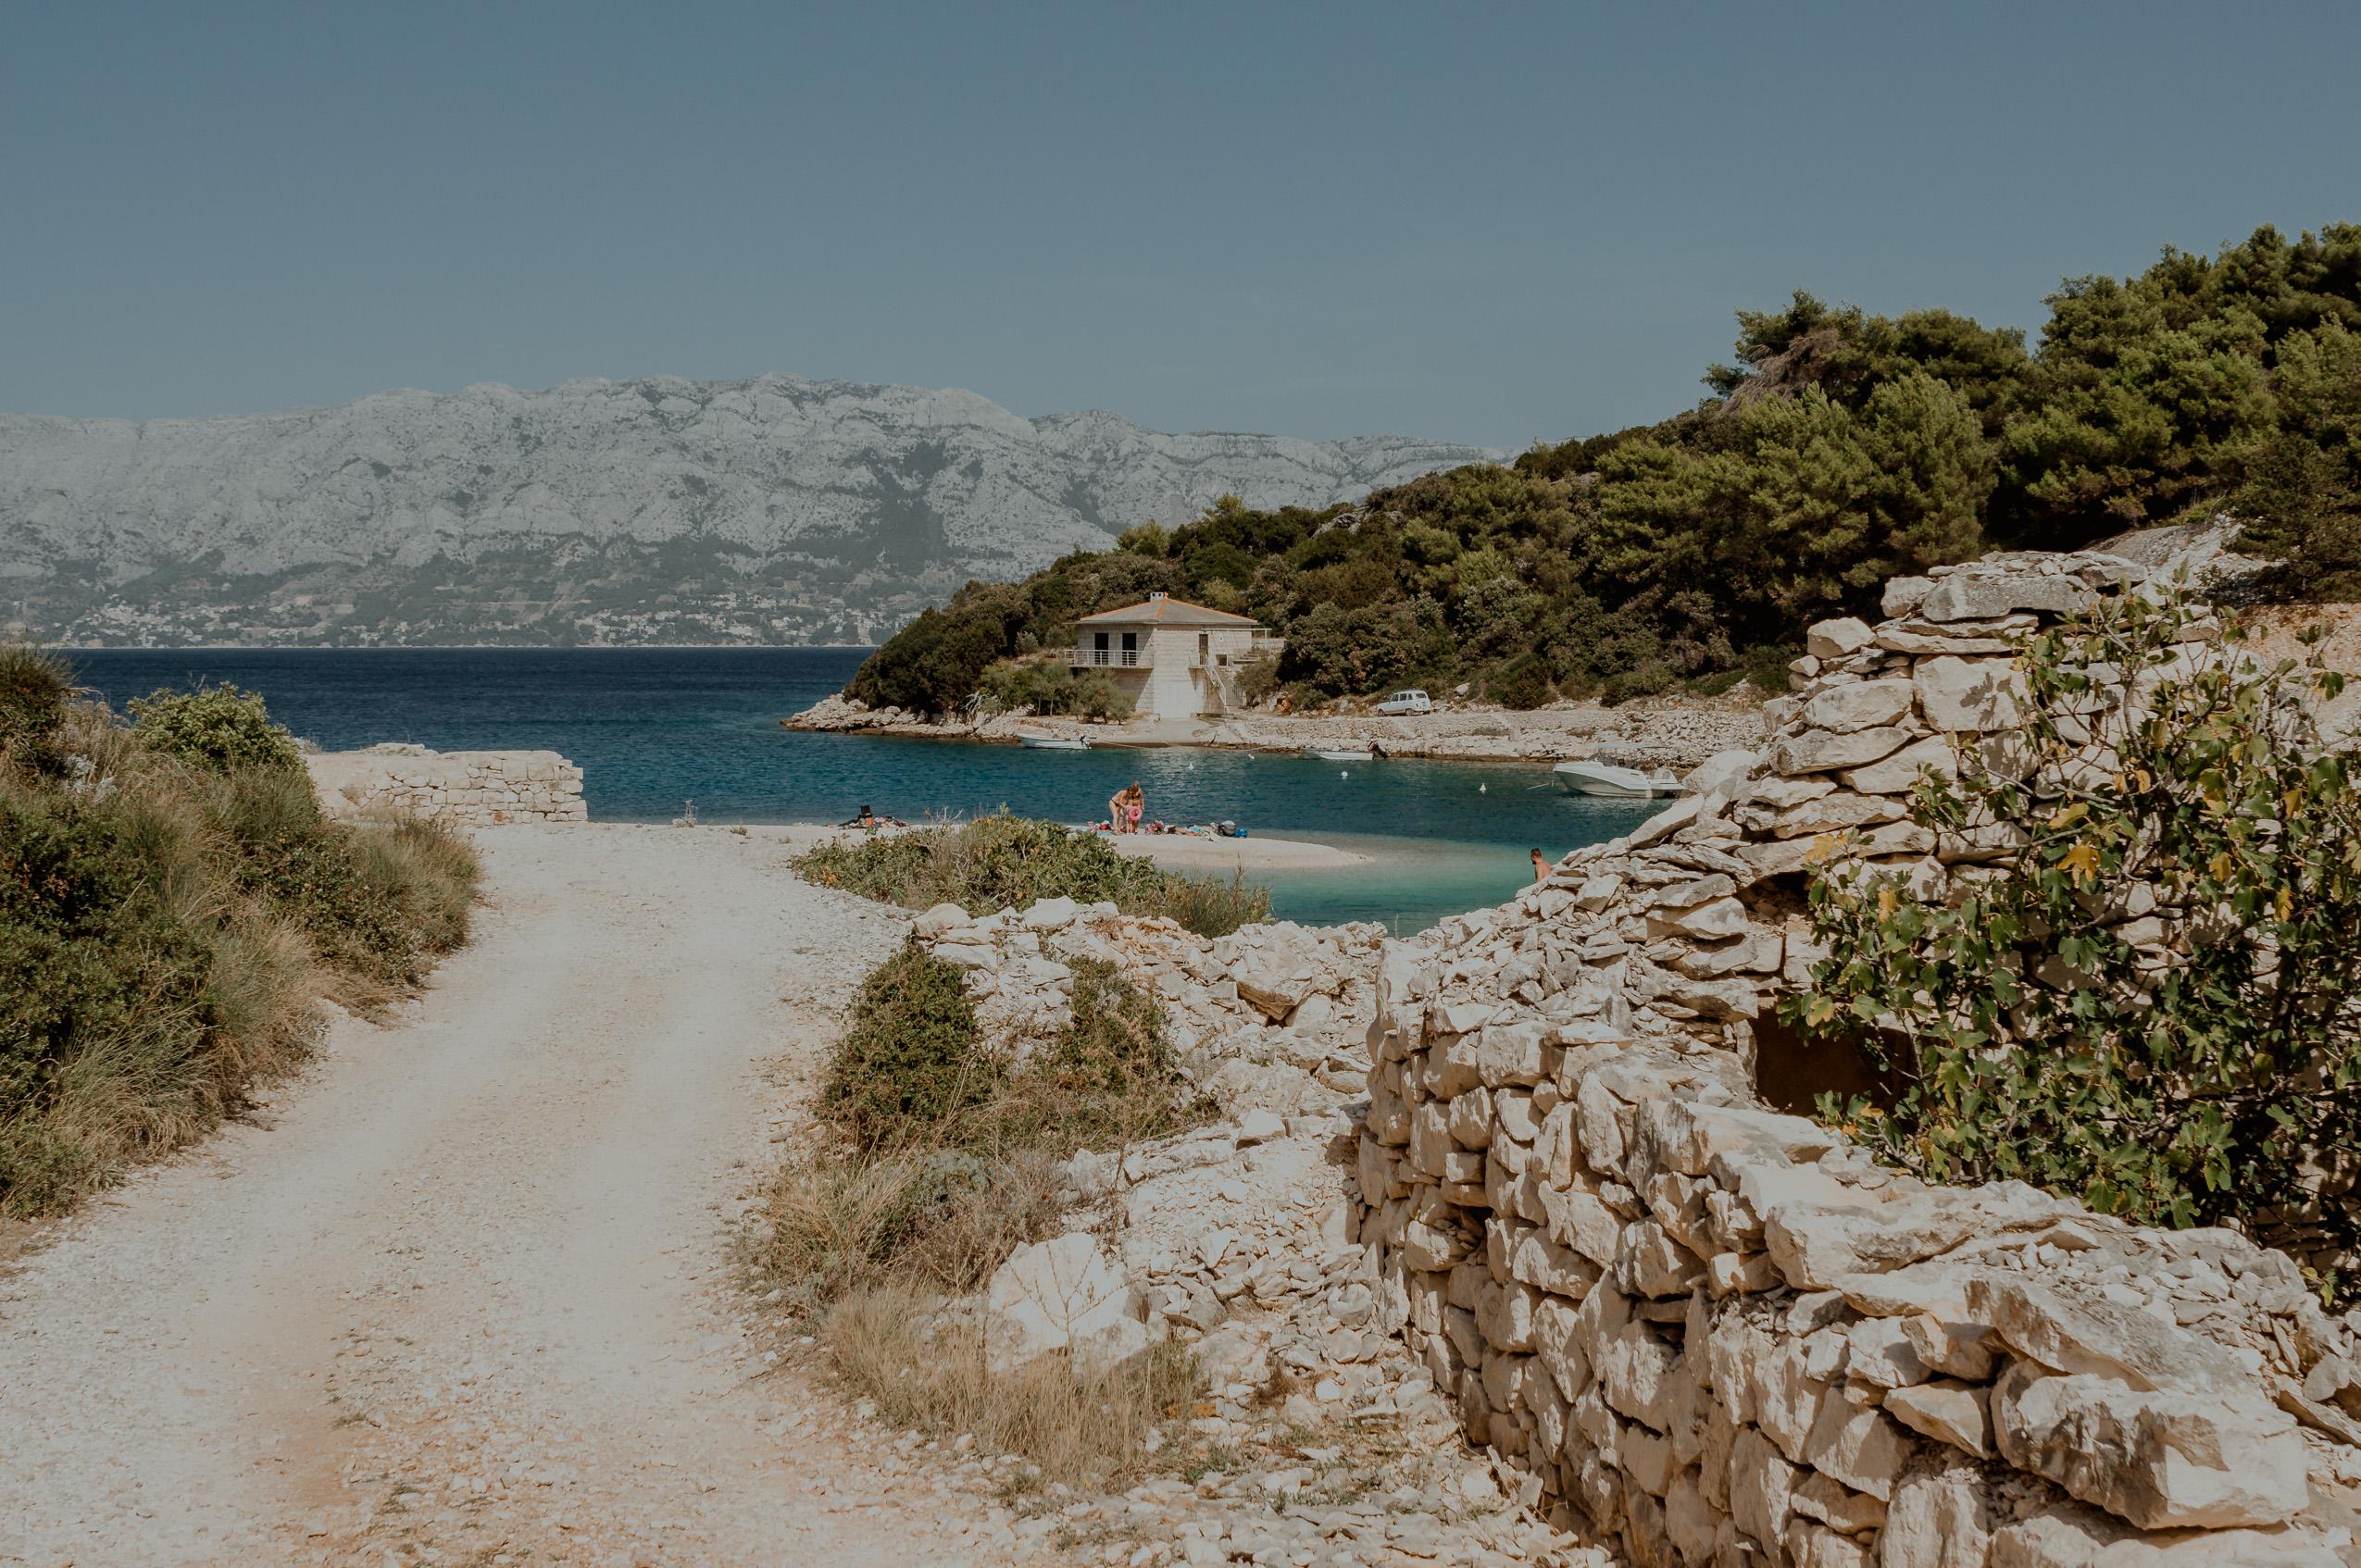 Chorwacja, wyspa Brač, dzień 6- Vidova Gora, Povlja i Tičja Luka, zatoka Lovrečina